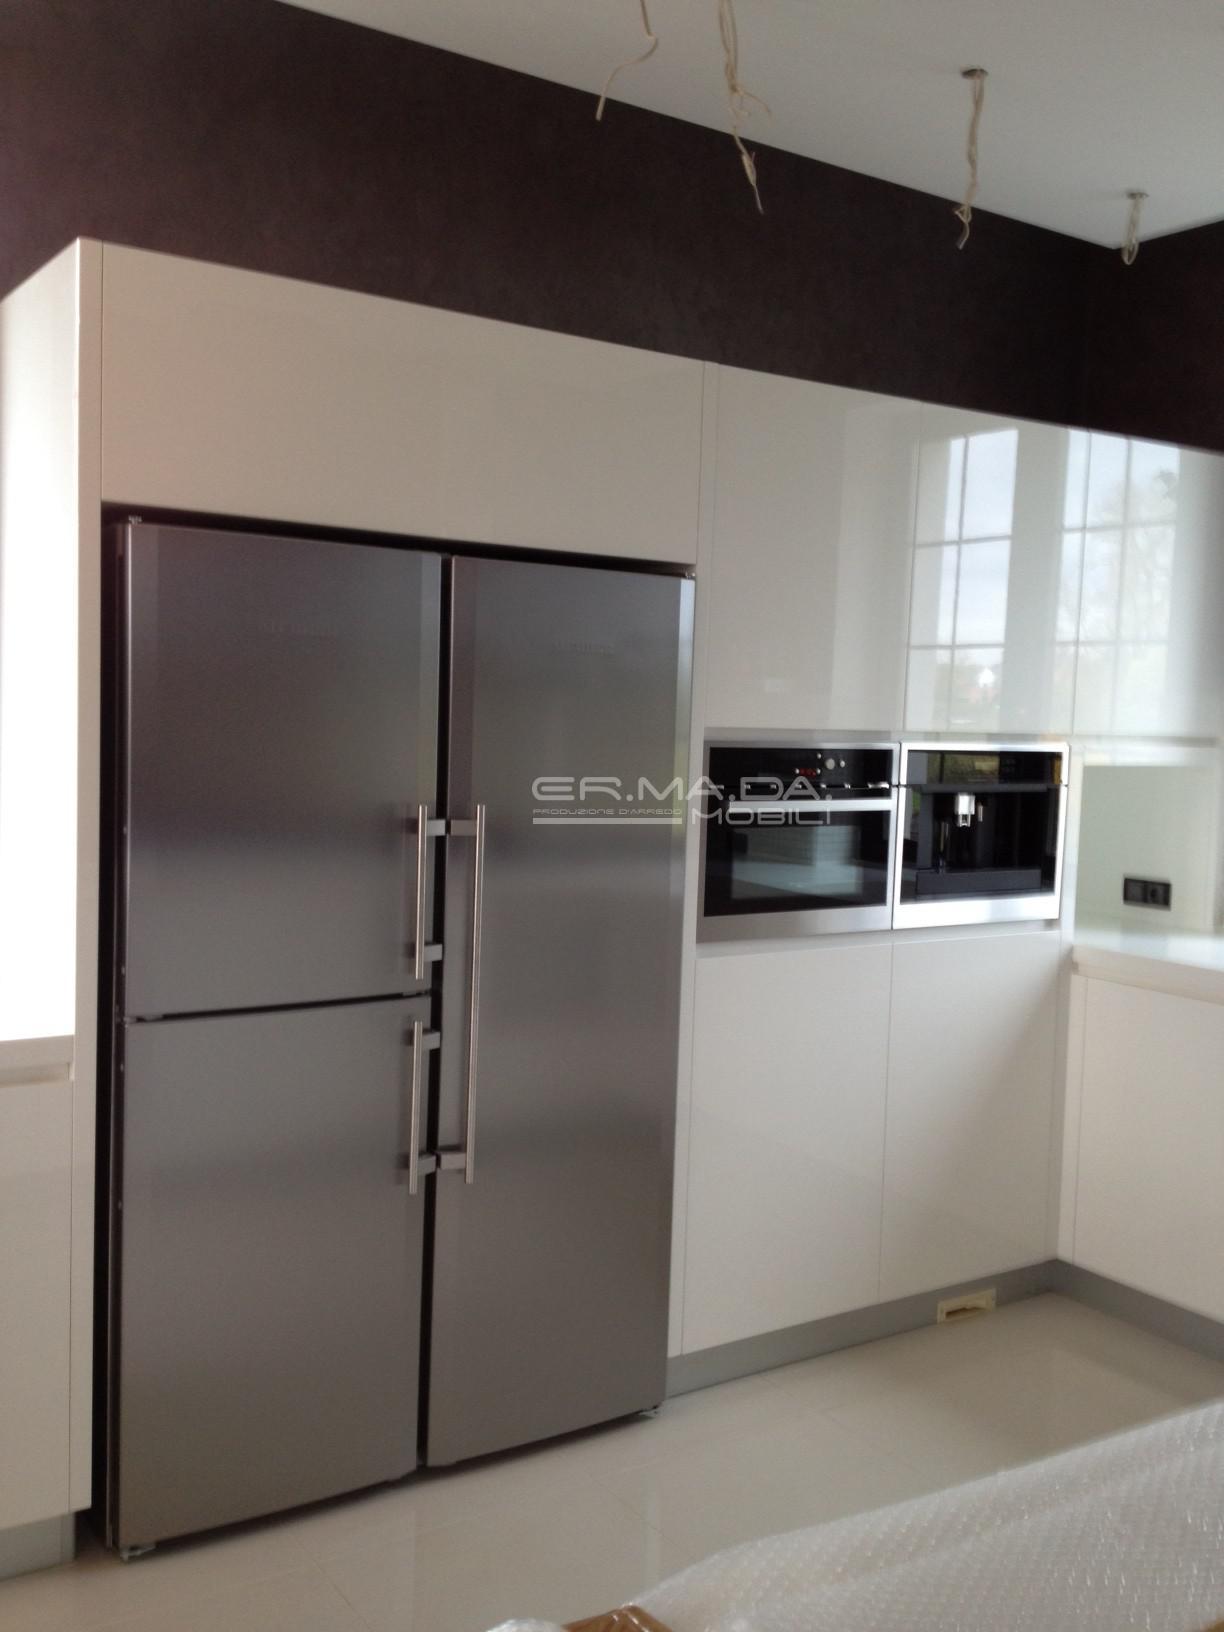 13 cucina laccata bianco lucido er ma da mobilificio - Cucina bianco lucido ...